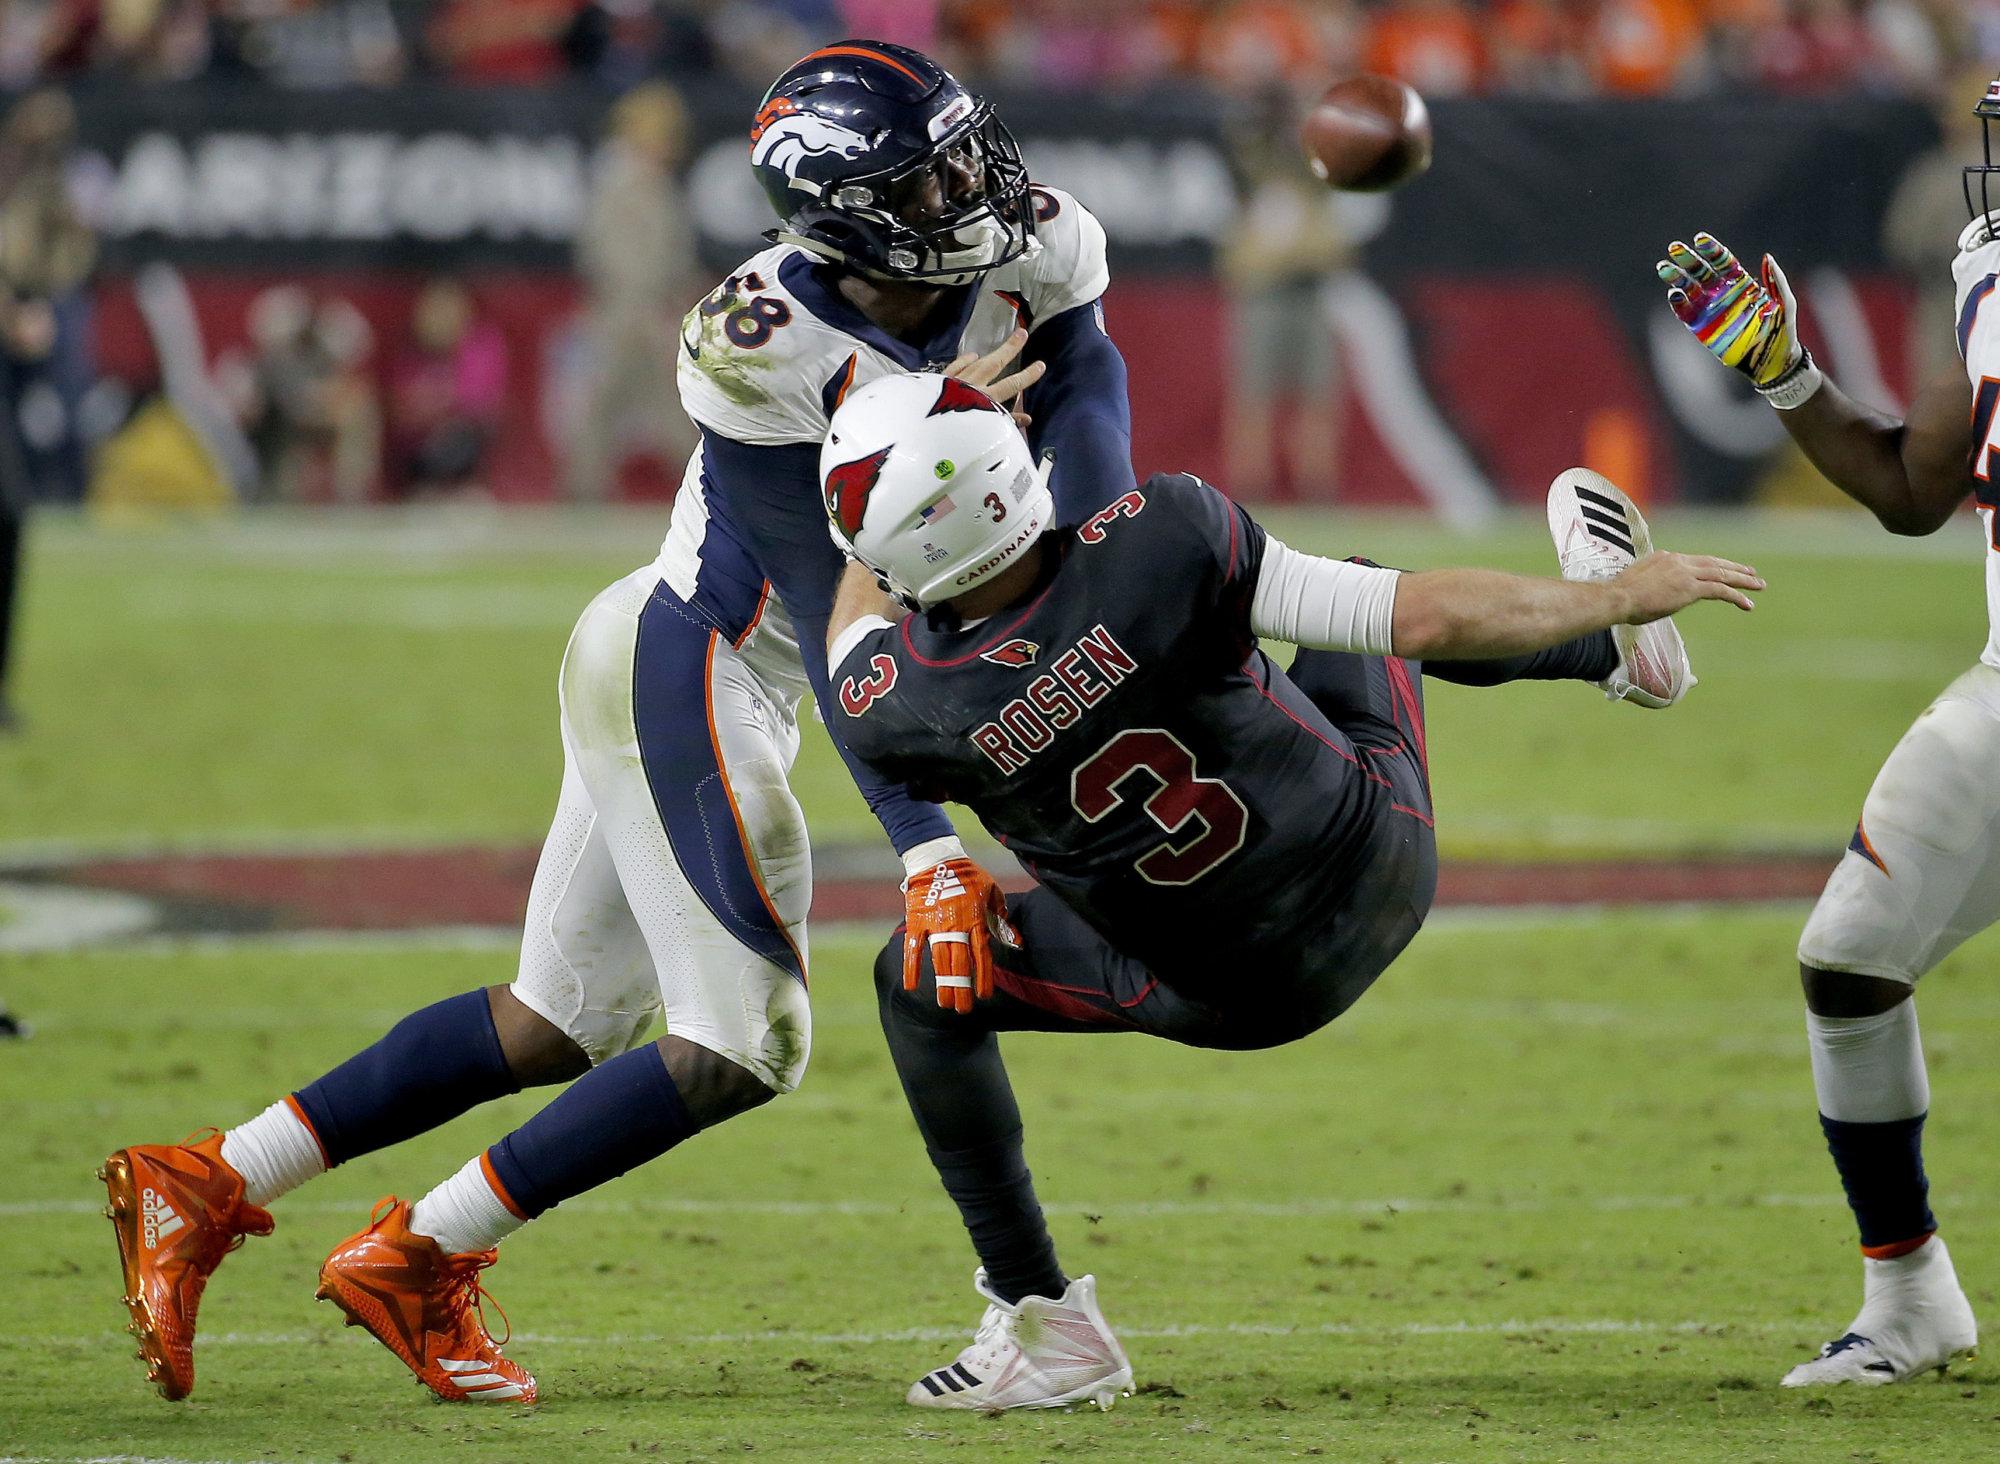 Denver Broncos linebacker Von Miller (58) hits Arizona Cardinals quarterback Josh Rosen (3) as he throws during the second half of an NFL football game, Thursday, Oct. 18, 2018, in Glendale, Ariz. (AP Photo/Rick Scuteri)